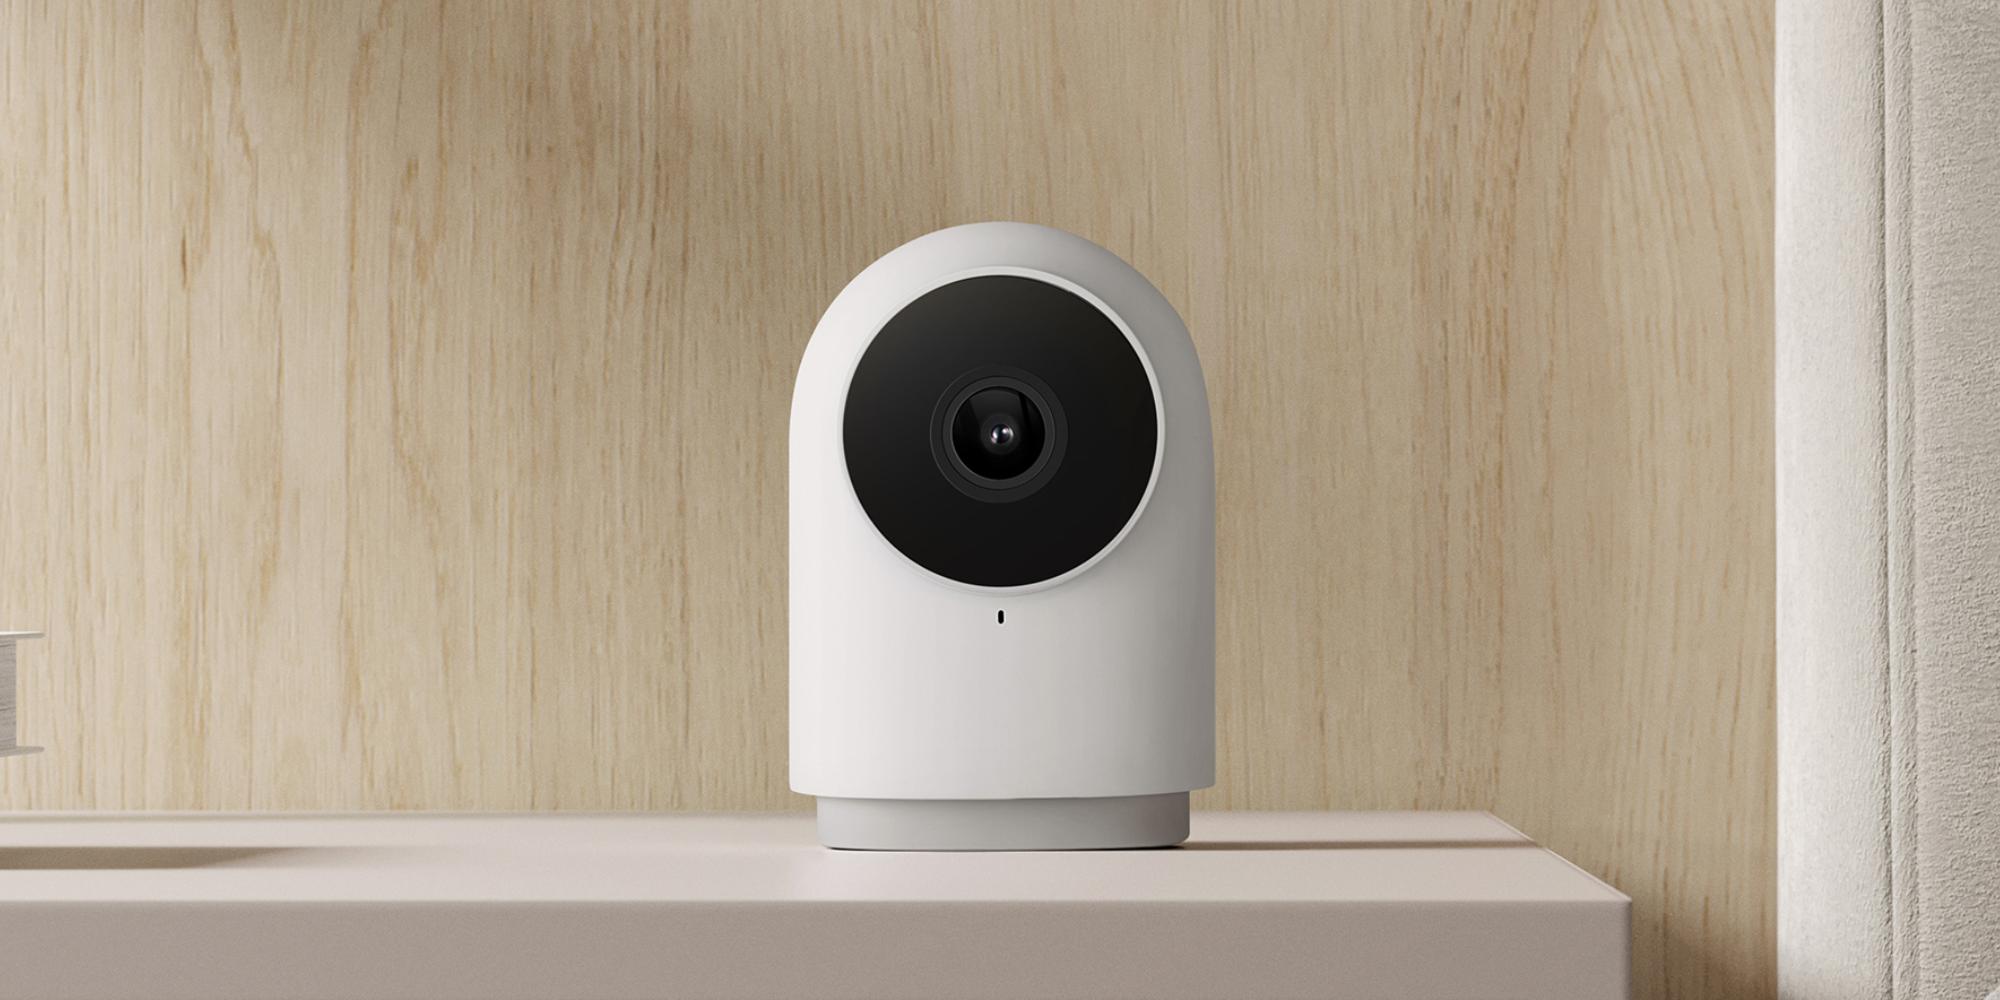 photo of HomeKit Weekly: Aqara G2H acts as an Aqara hub and also supports HomeKit Secure Video image